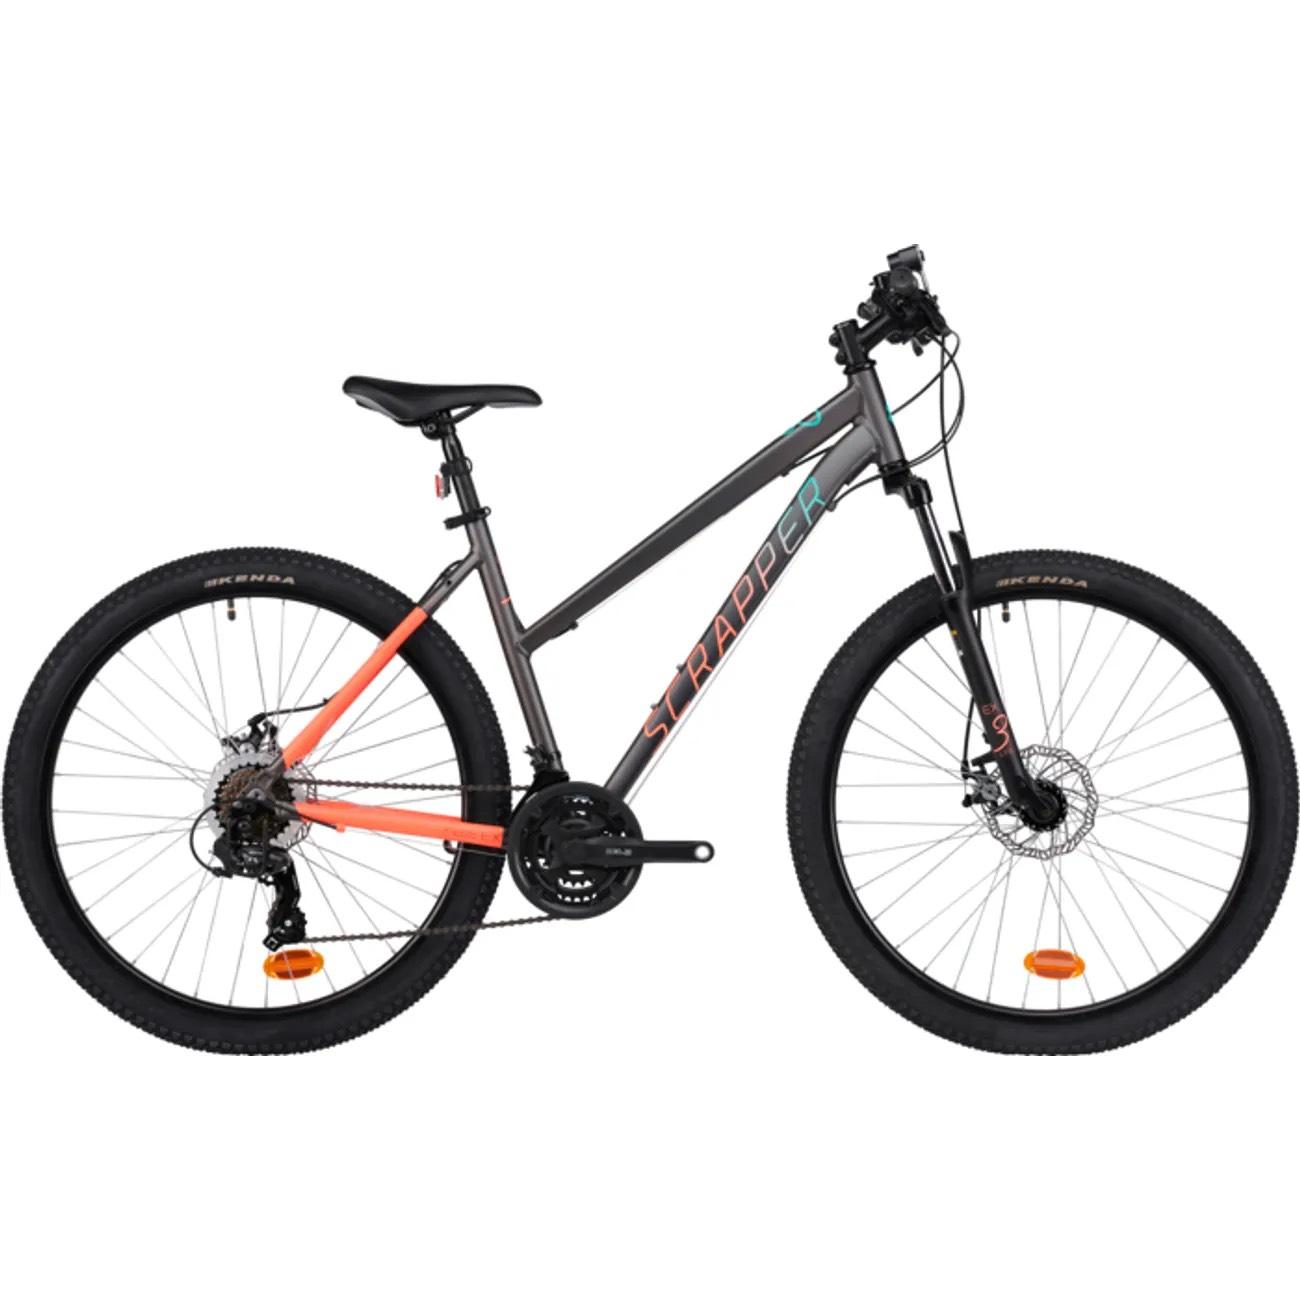 Vélo Scrapper Exalta 3.0LTD - Tailles L ou M